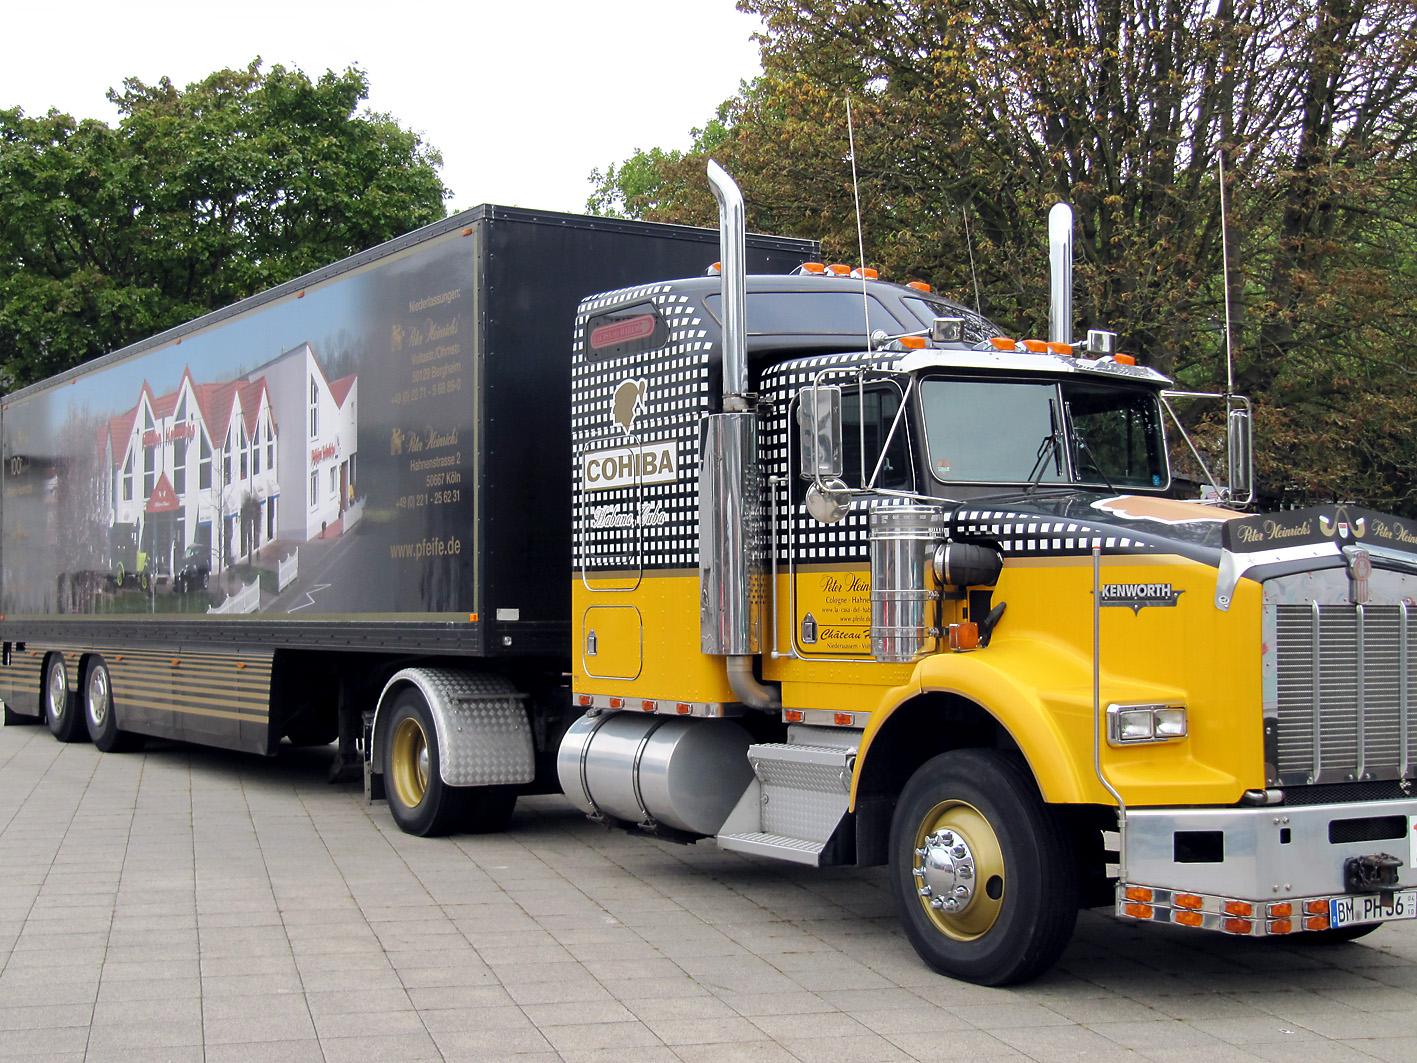 a_hires_cohiba_truck.JPG